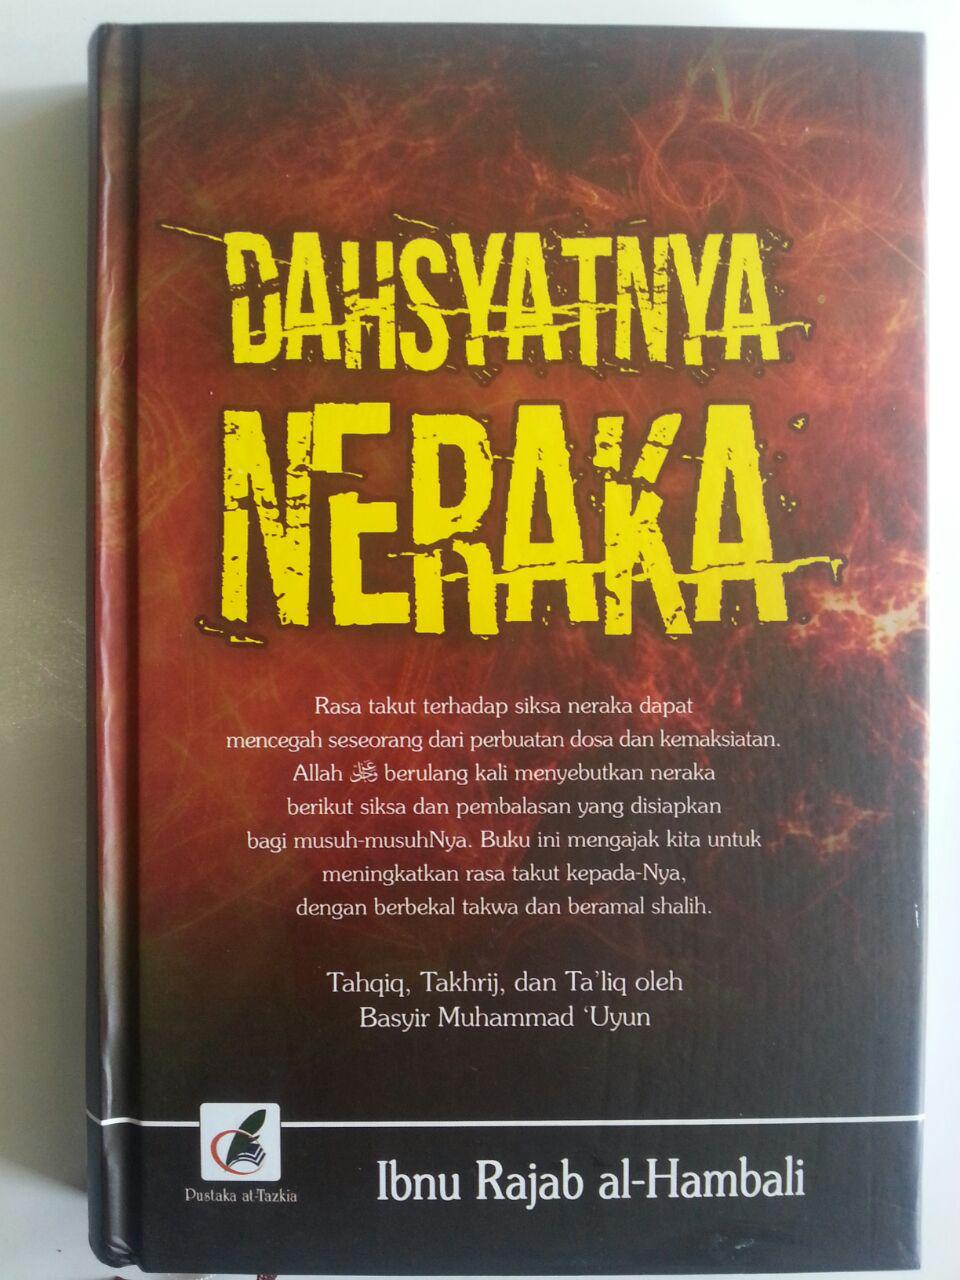 Buku Dahsyatnya Neraka isi cover 2